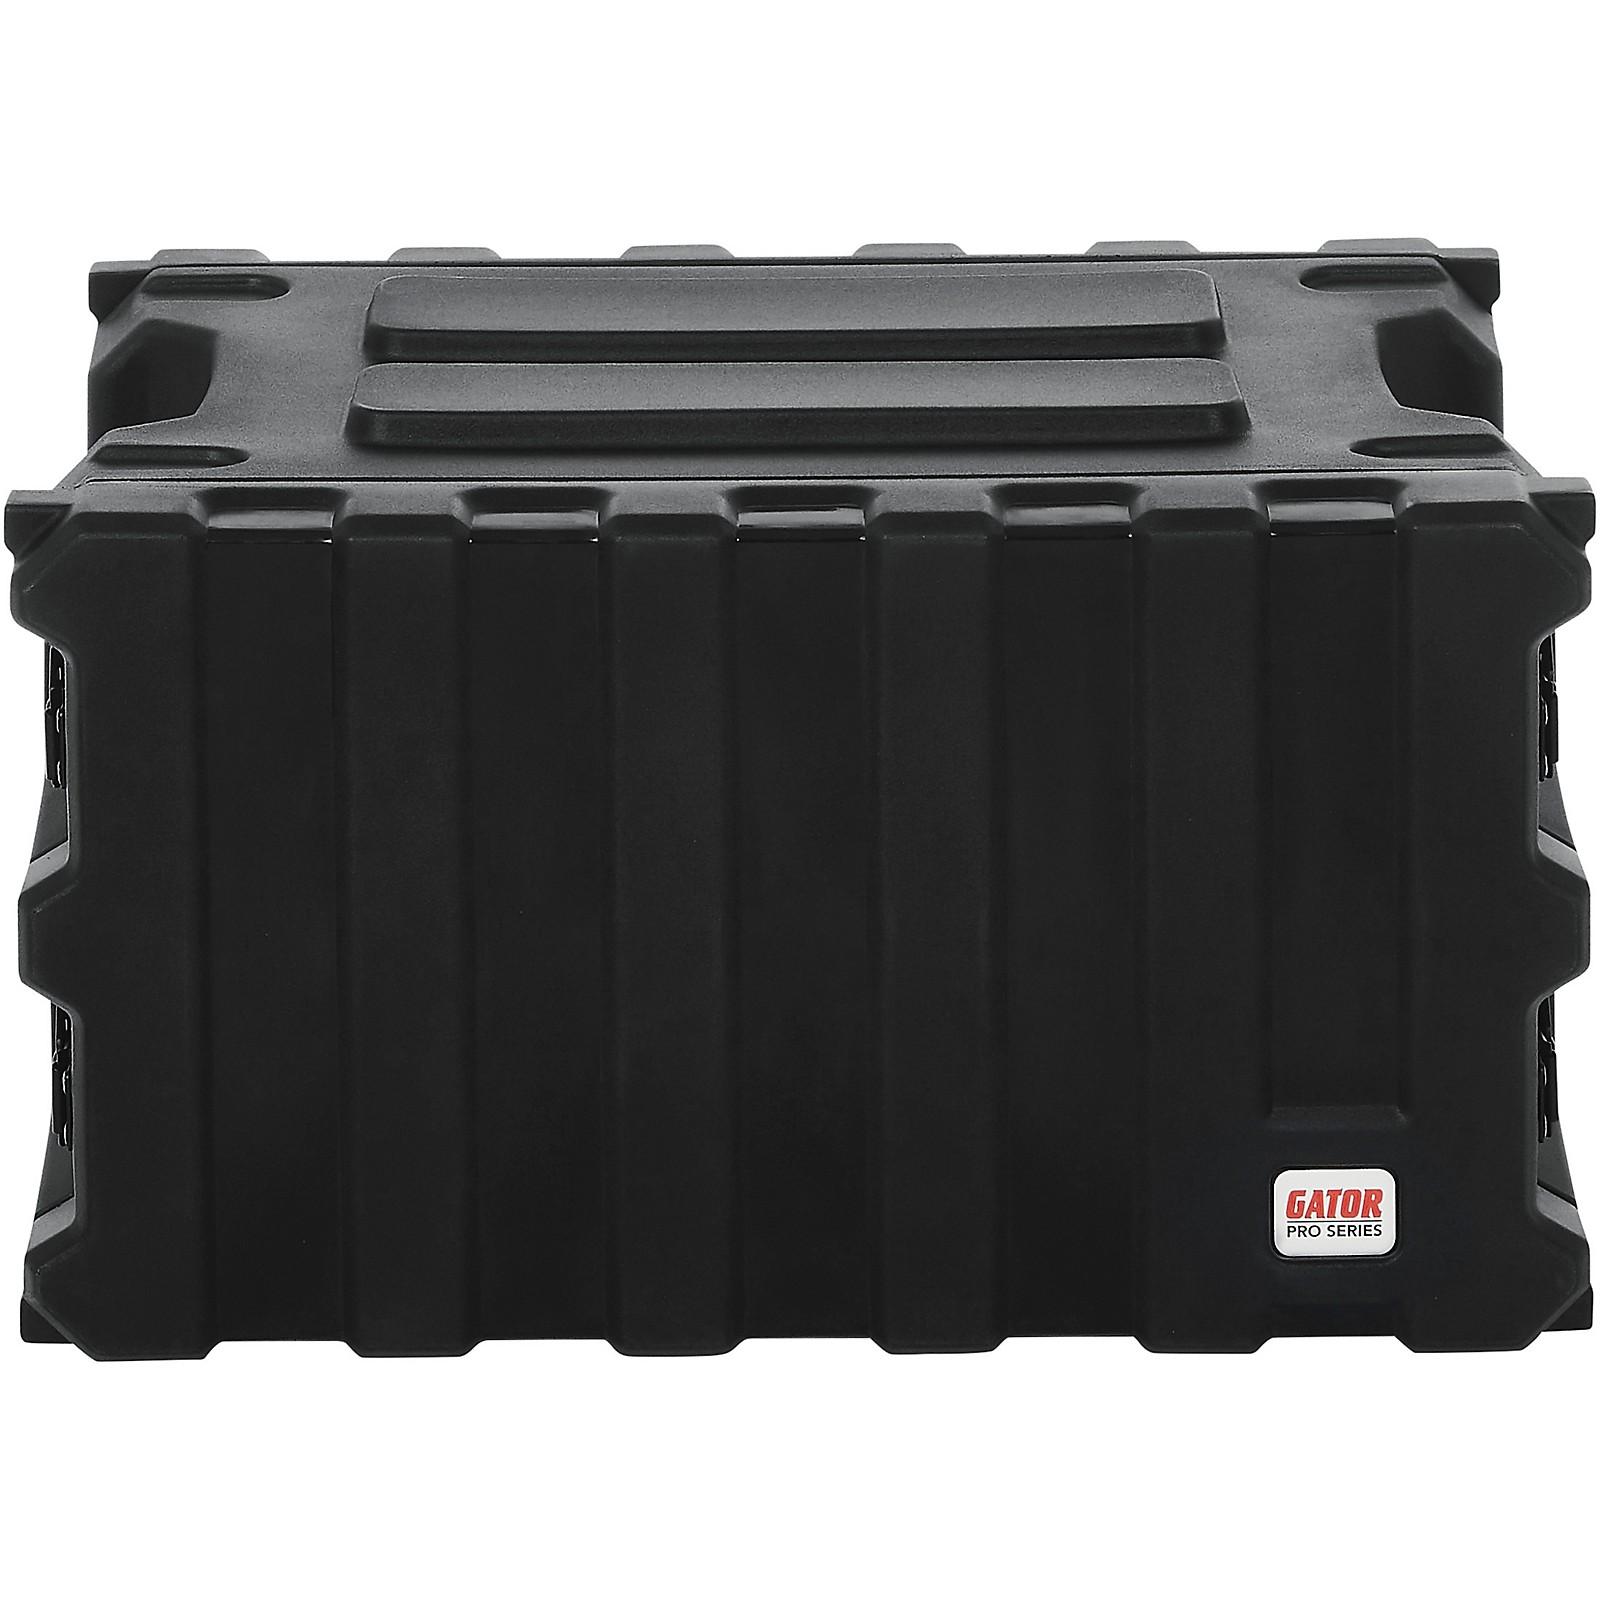 Gator Pro Series 6U, 13